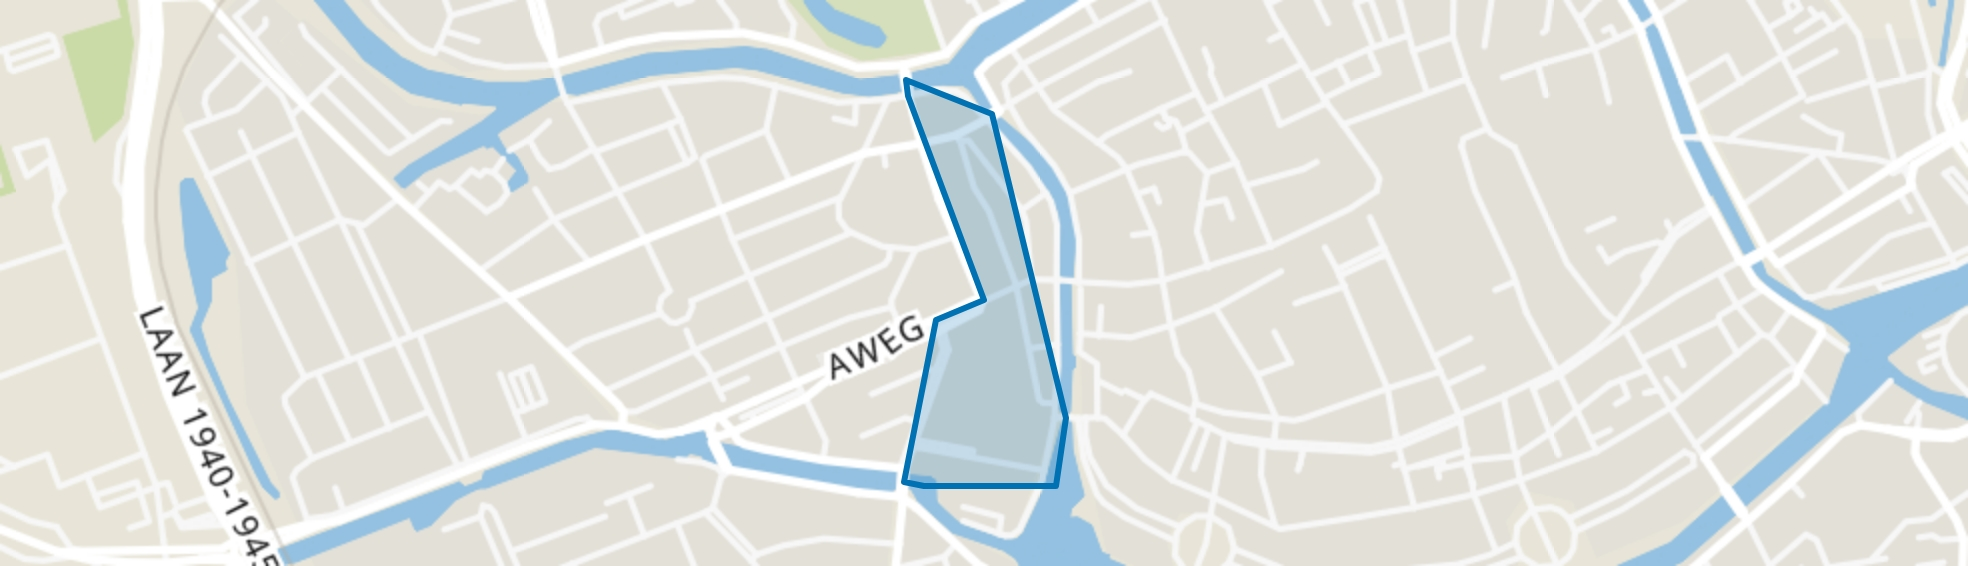 Binnenstad-West, Groningen map